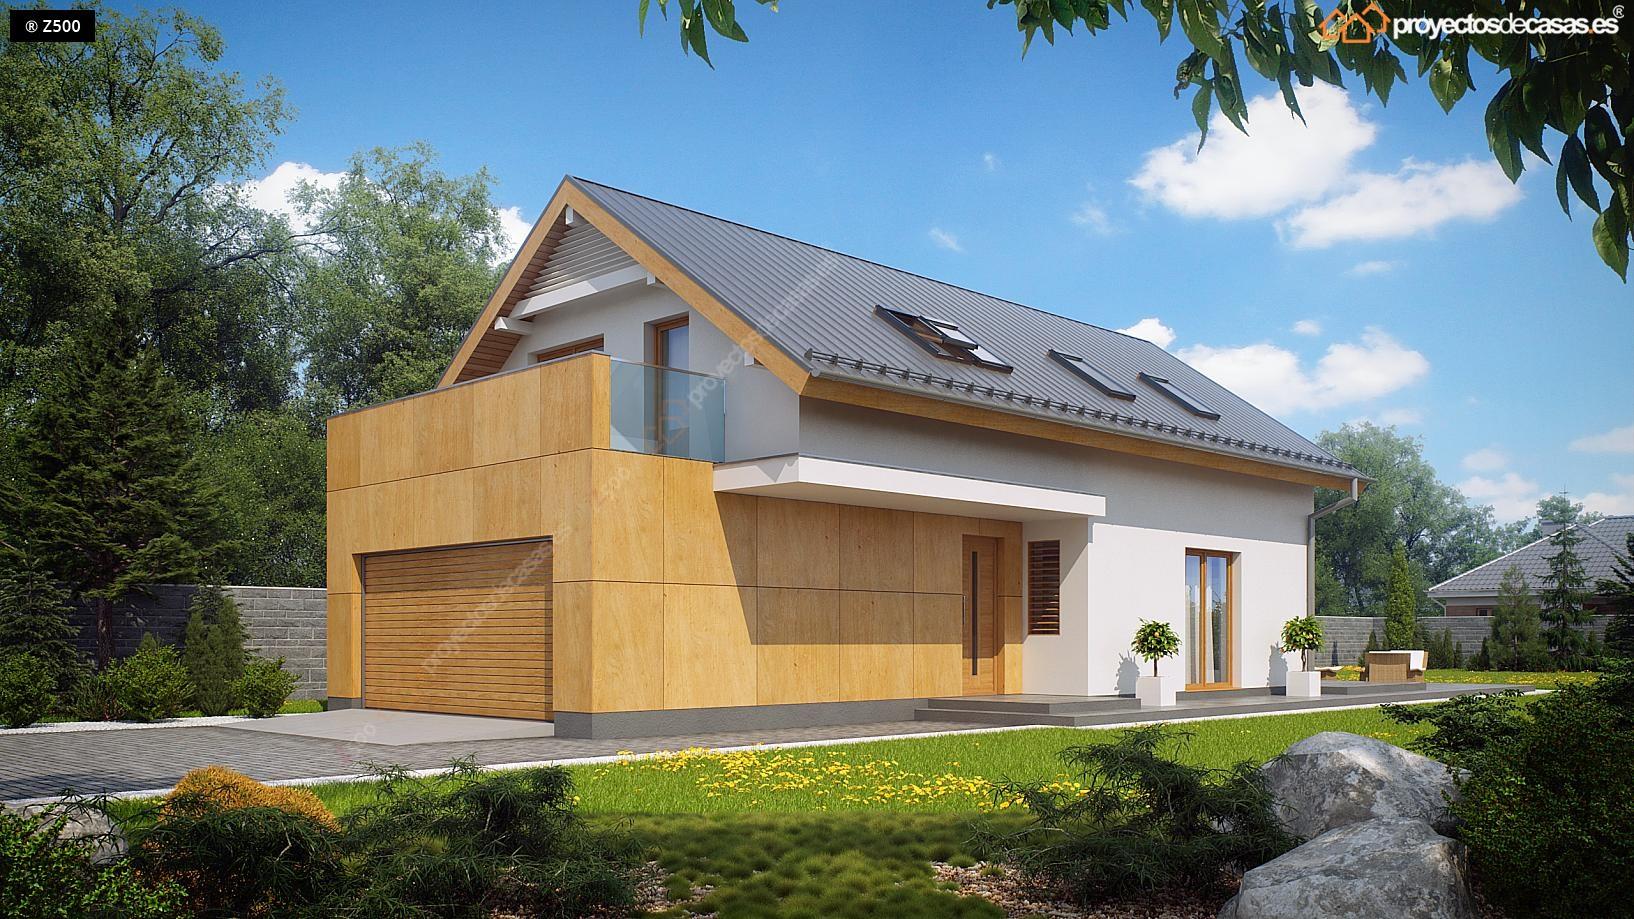 Proyectos de casas casa tradicional cubierta a dos aguas for Cubiertas para casas campestres